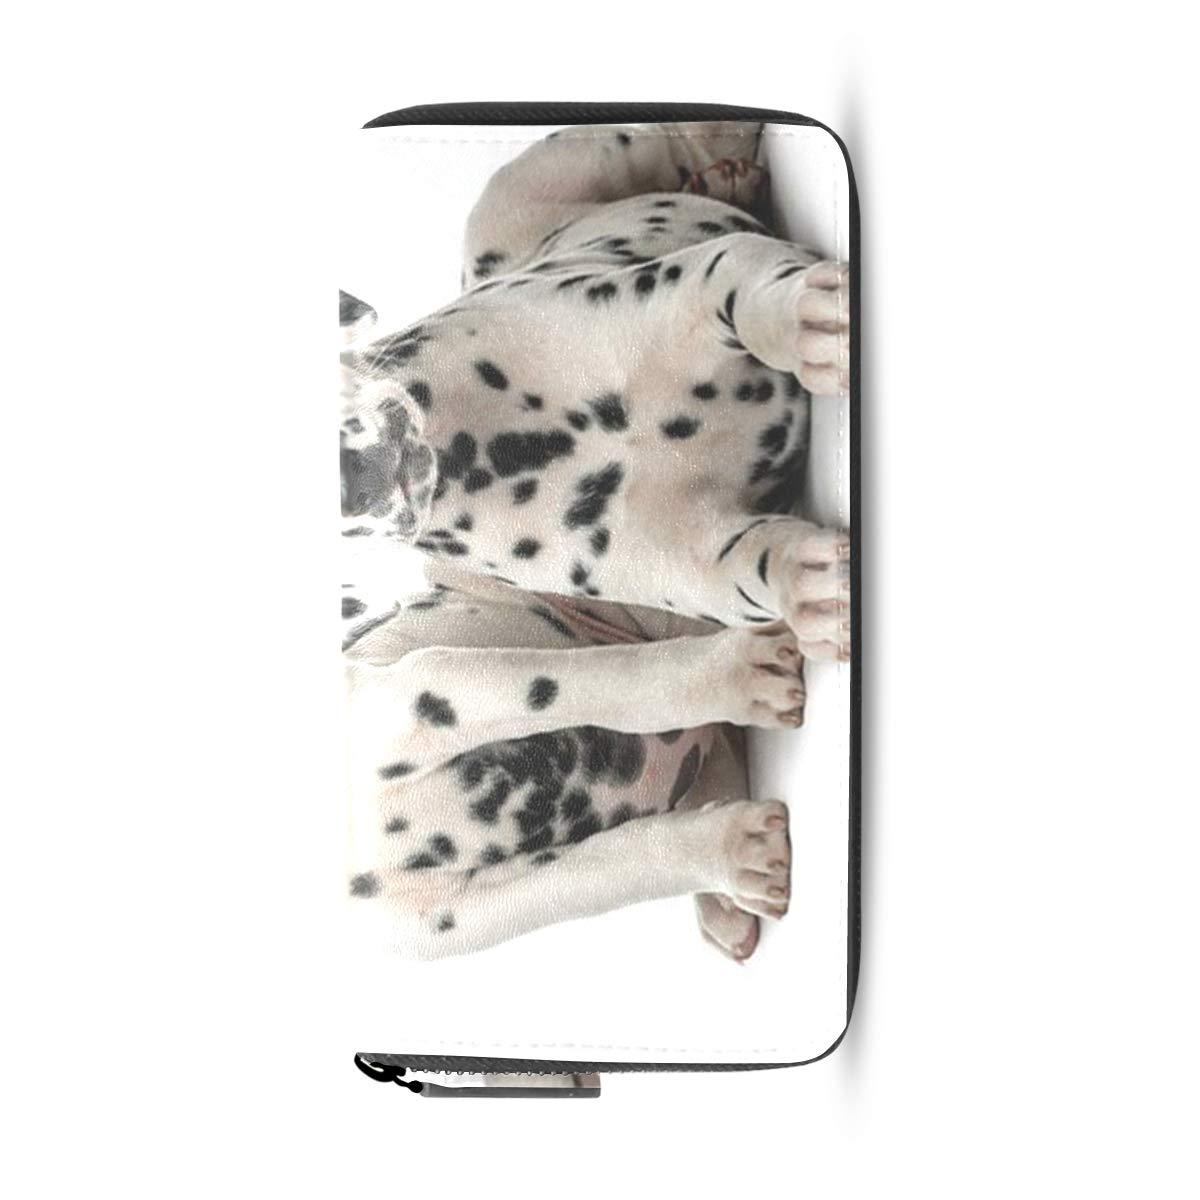 Womens Wallets Dalmatian Dog On The Mountain Leather Passport Wallet Coin Purse Girls Handbags